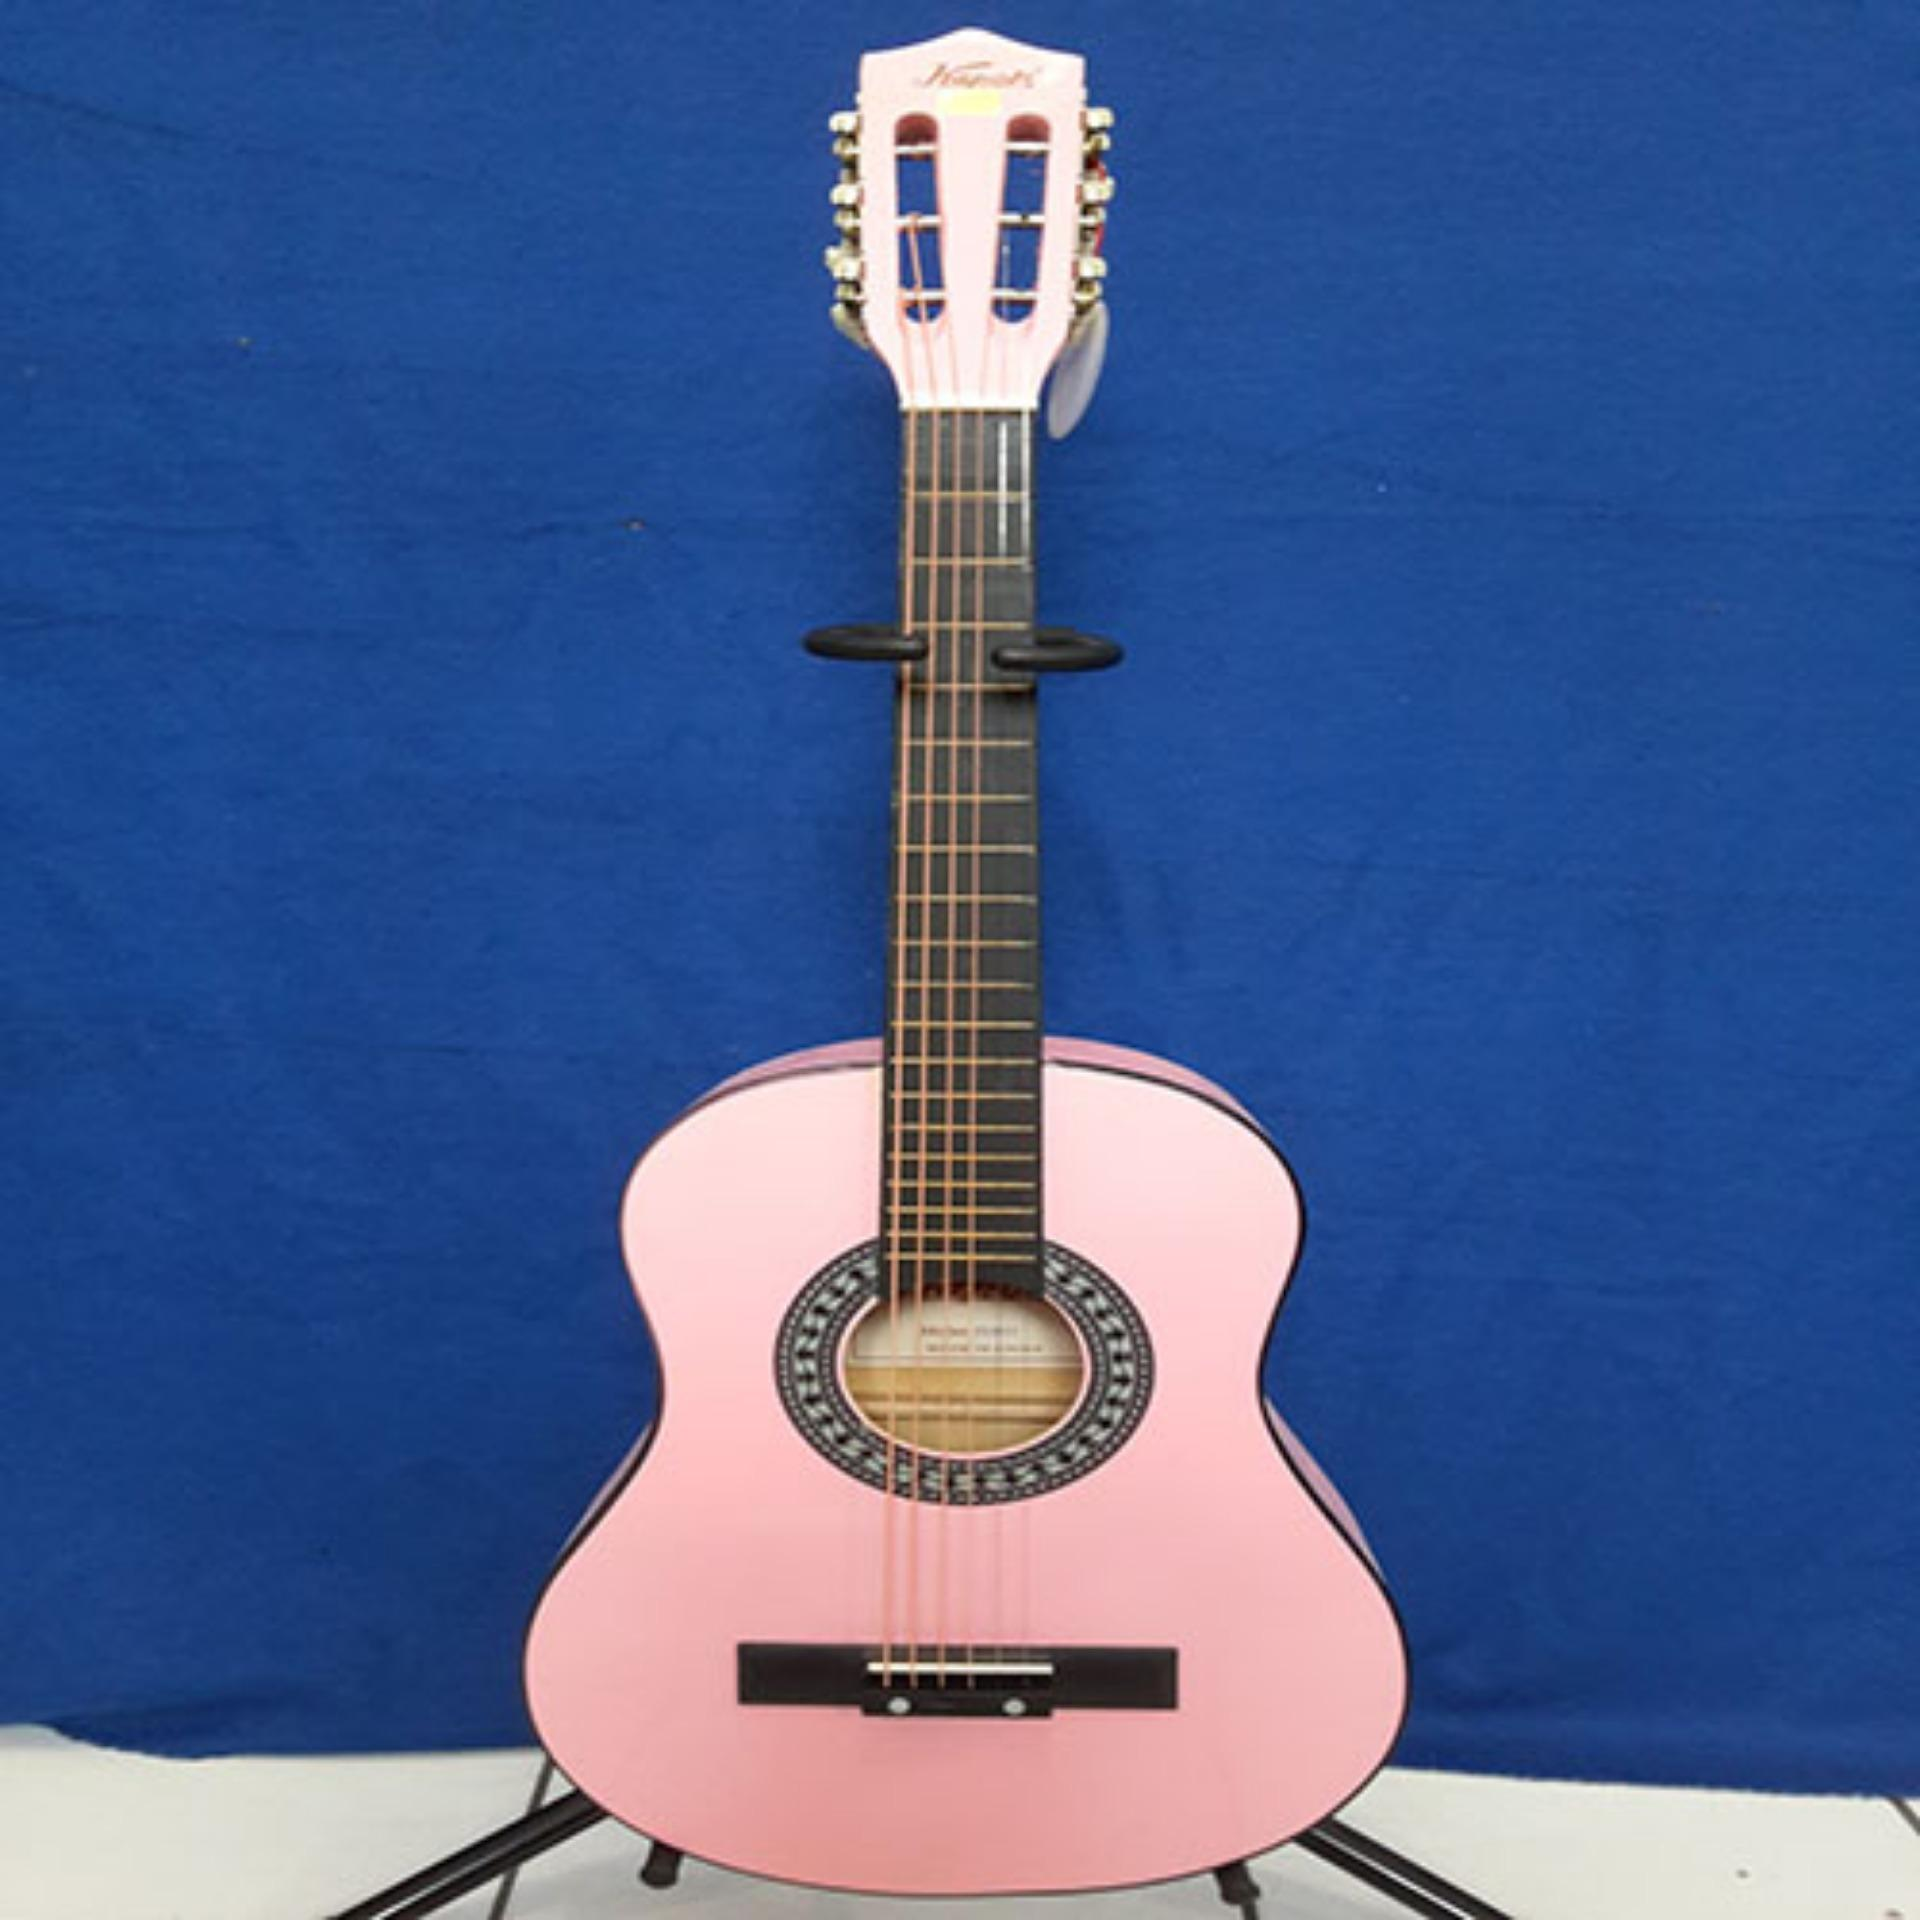 ... A105 0012 0053 Inci Warna Warni Dilapisi Paduan Tembaga Luka Senar Source Gitar Kecil Akustik Kapok